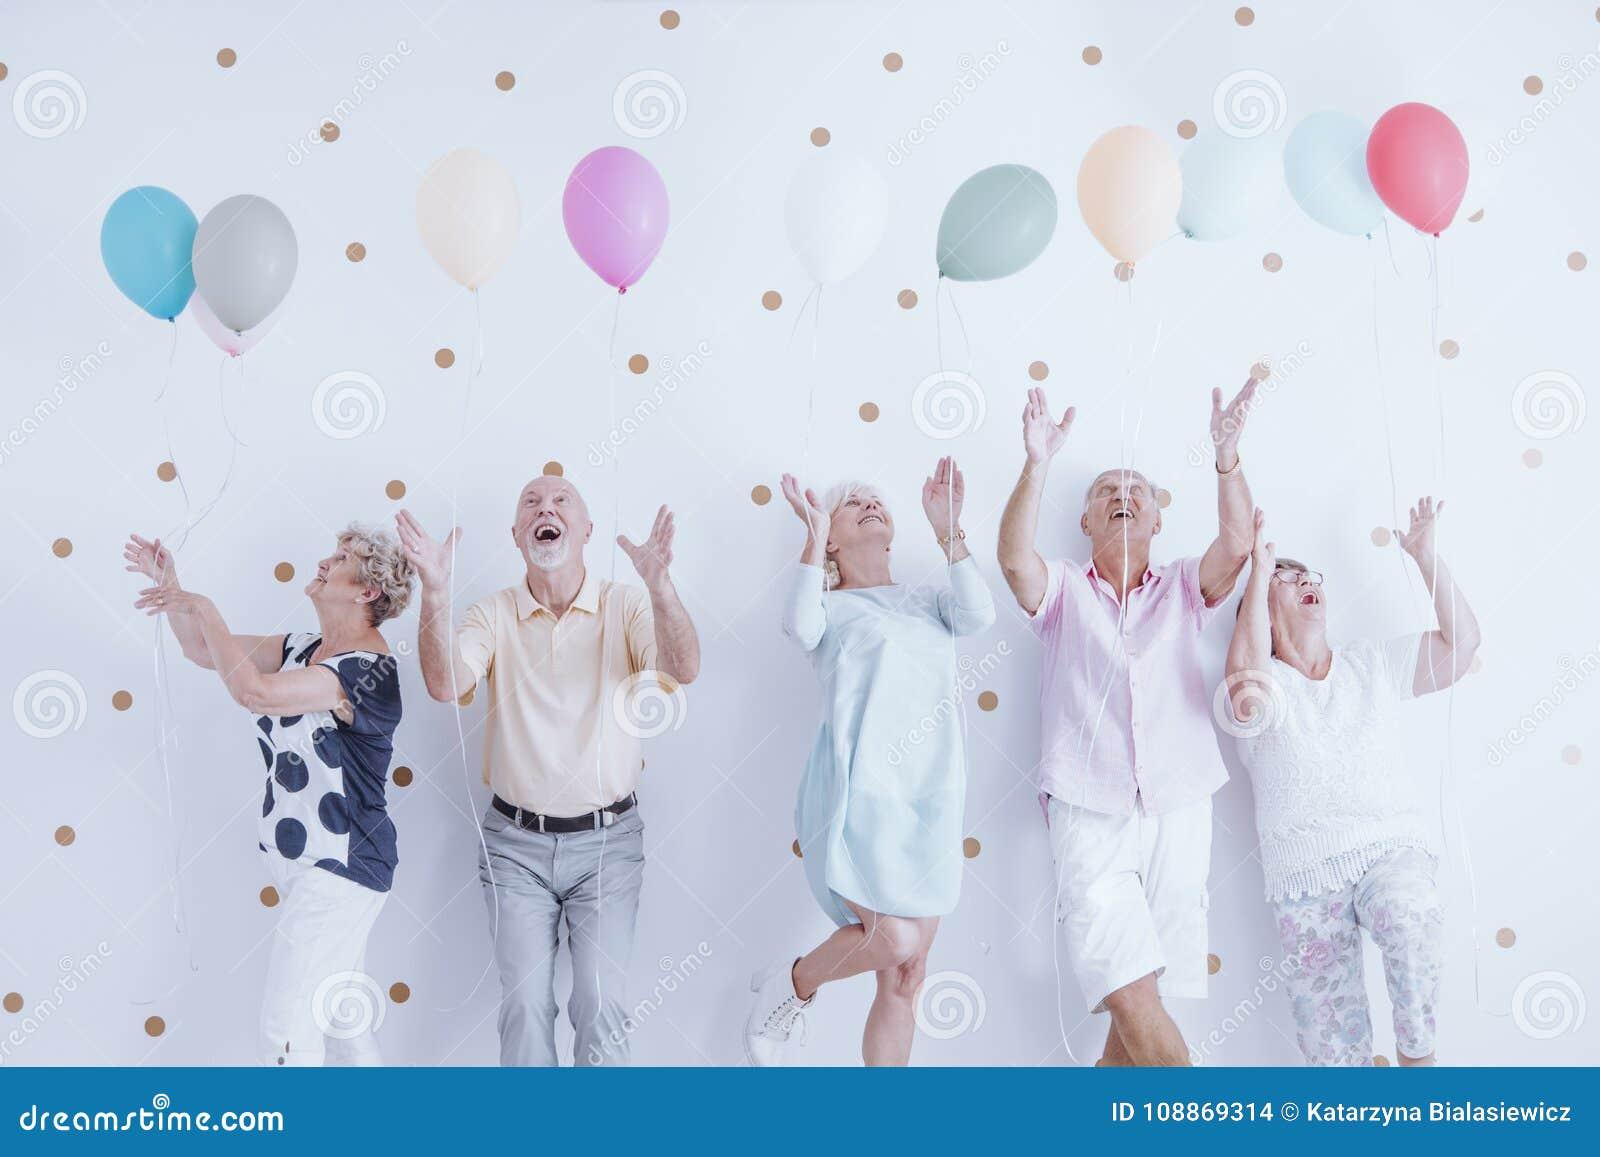 Excited elderly men and women